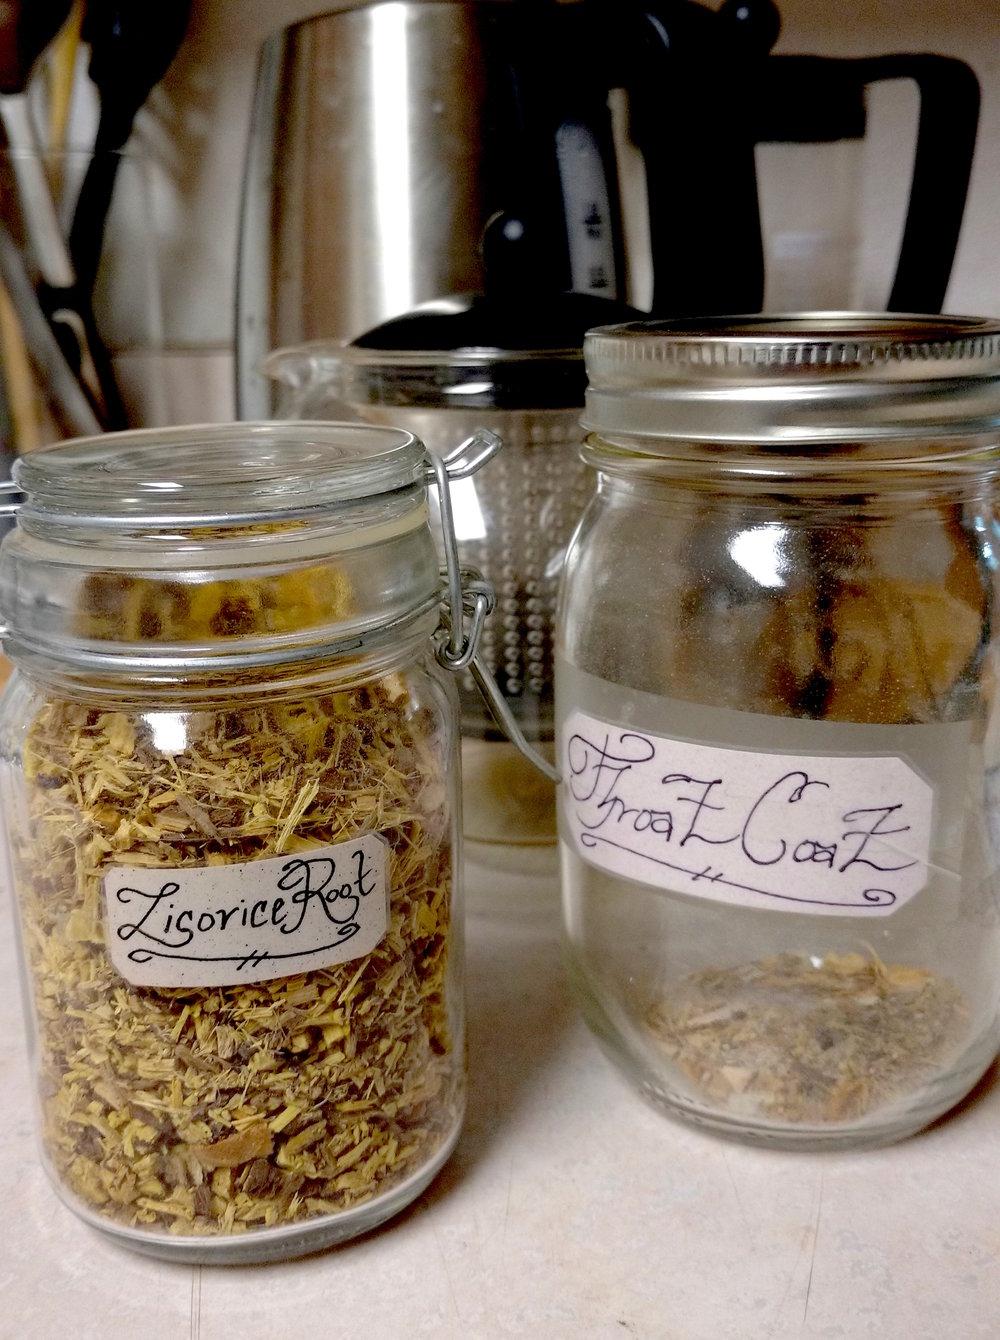 Licorice root teas.jpg